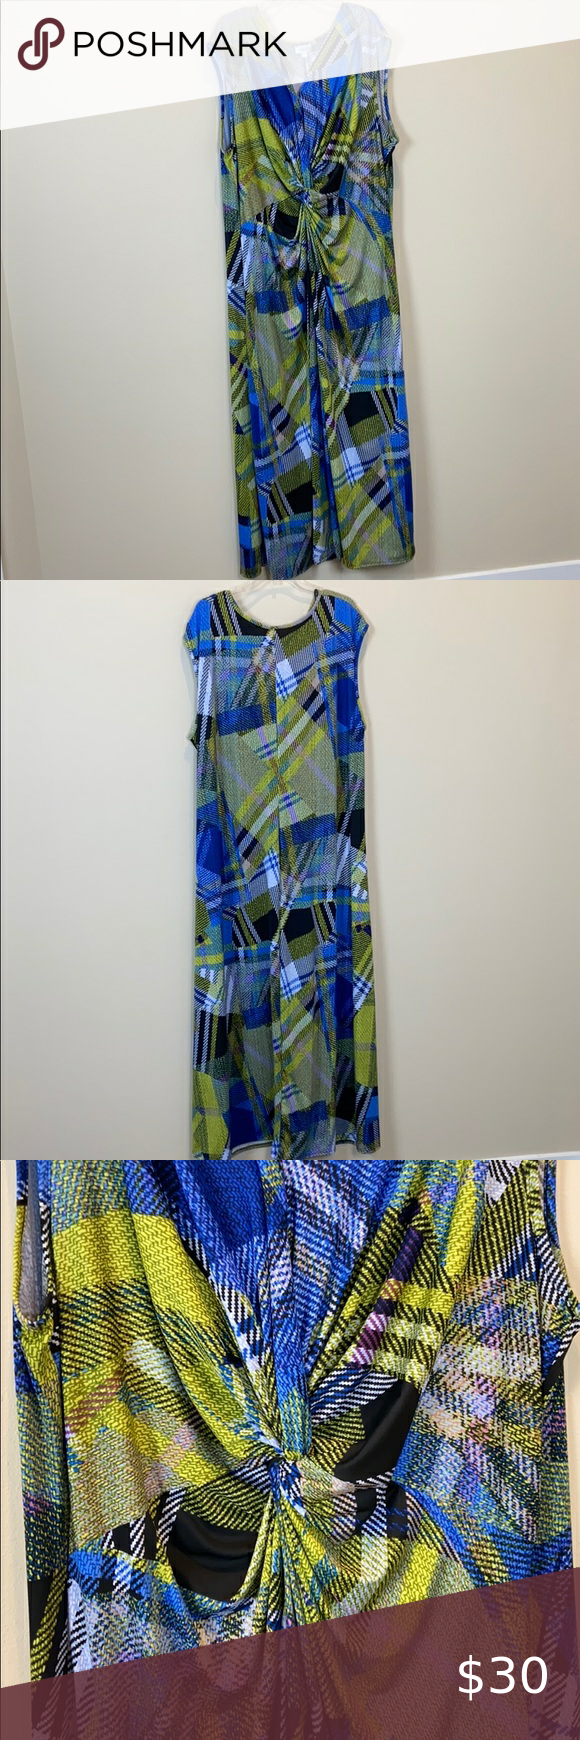 Avenue Flowy Maxi Dress 30 32 4x Multi Color Avenue Maxi Dress Ruching Detail On Bust 30 32 4x Multi Color Flowy Maxi Dress Maxi Dress Clothes Design [ 1740 x 580 Pixel ]